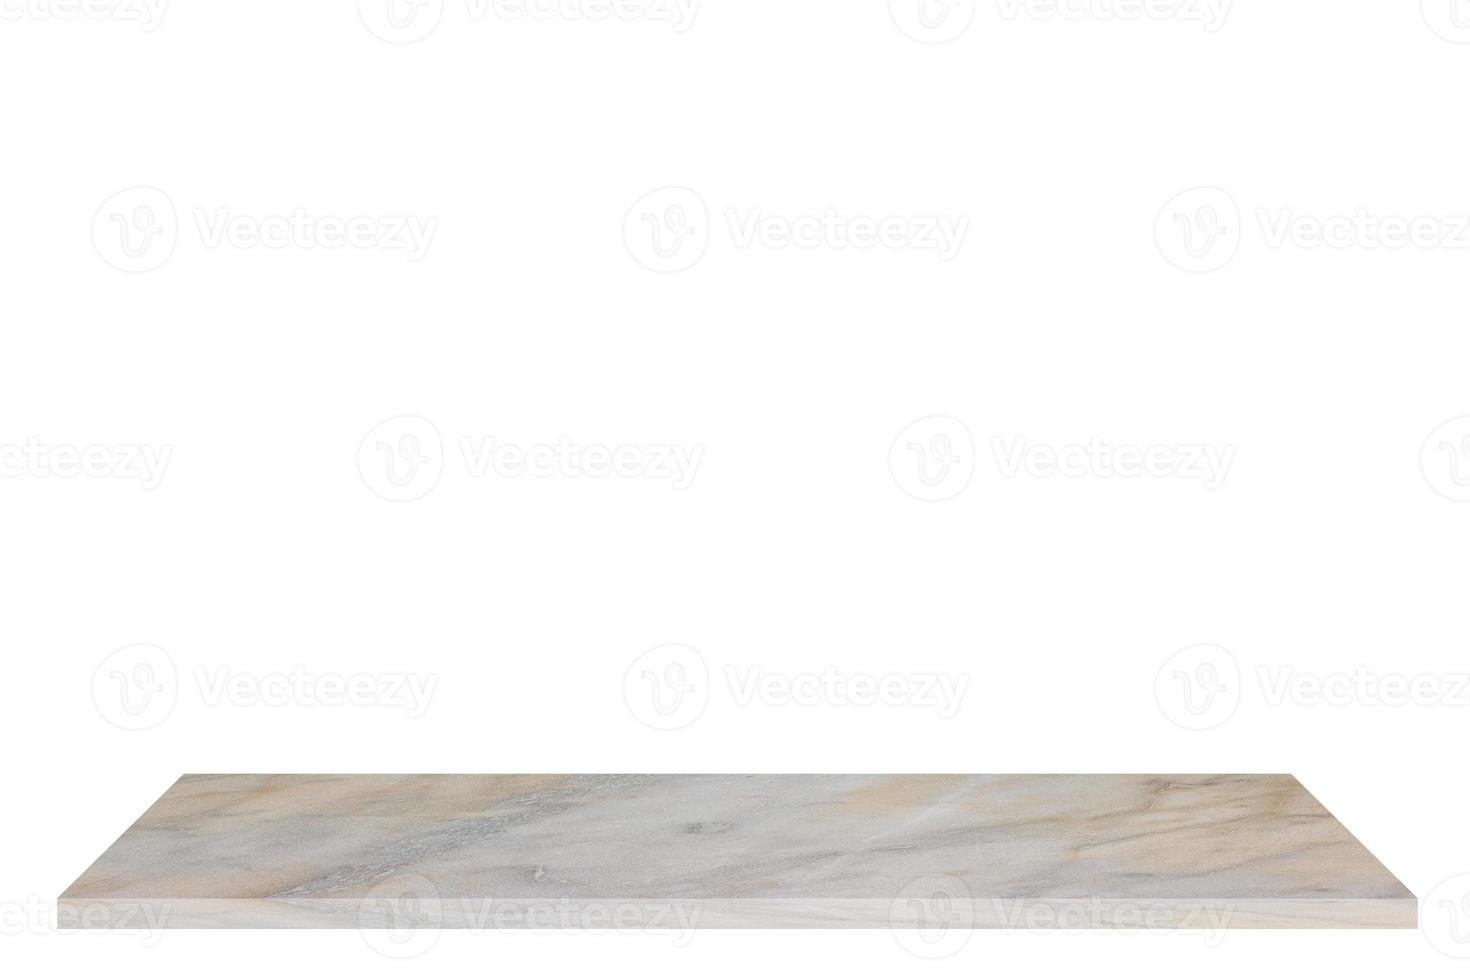 mármol blanco sobre fondo blanco foto